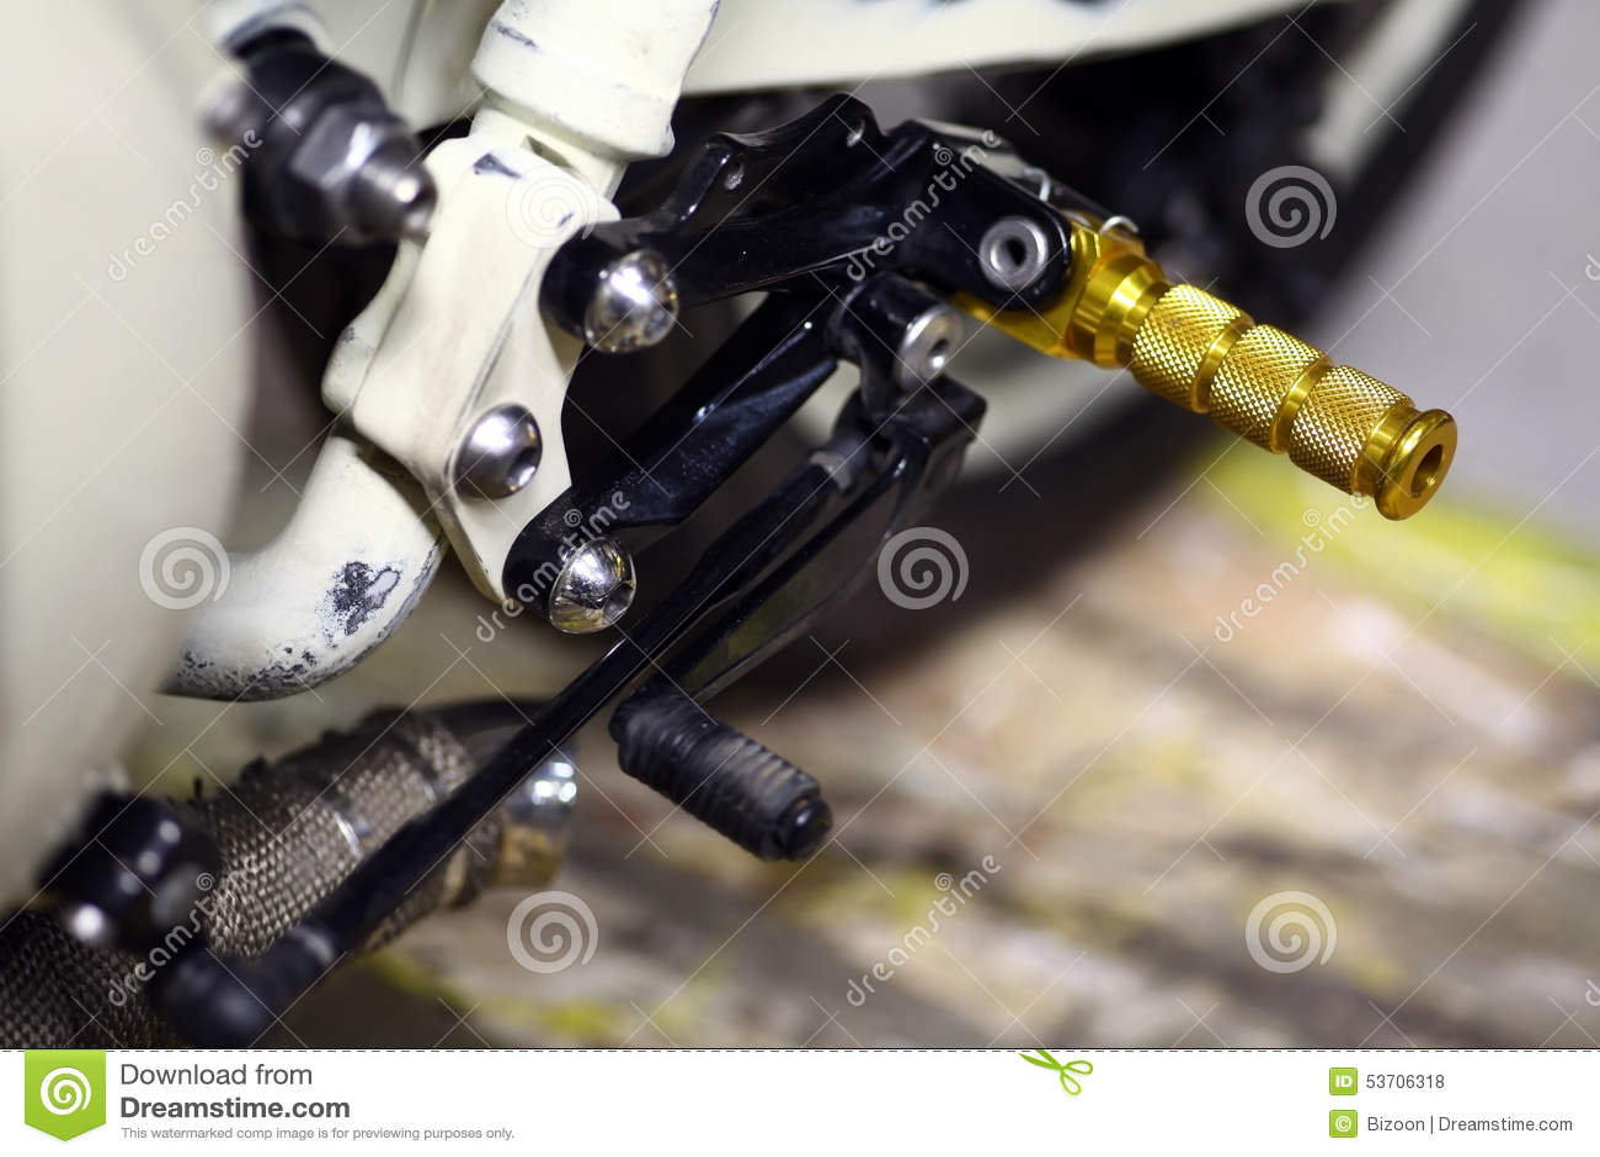 Motorcycle Gear Shifter Stock Photo Image Of Shift Shifter 53706318